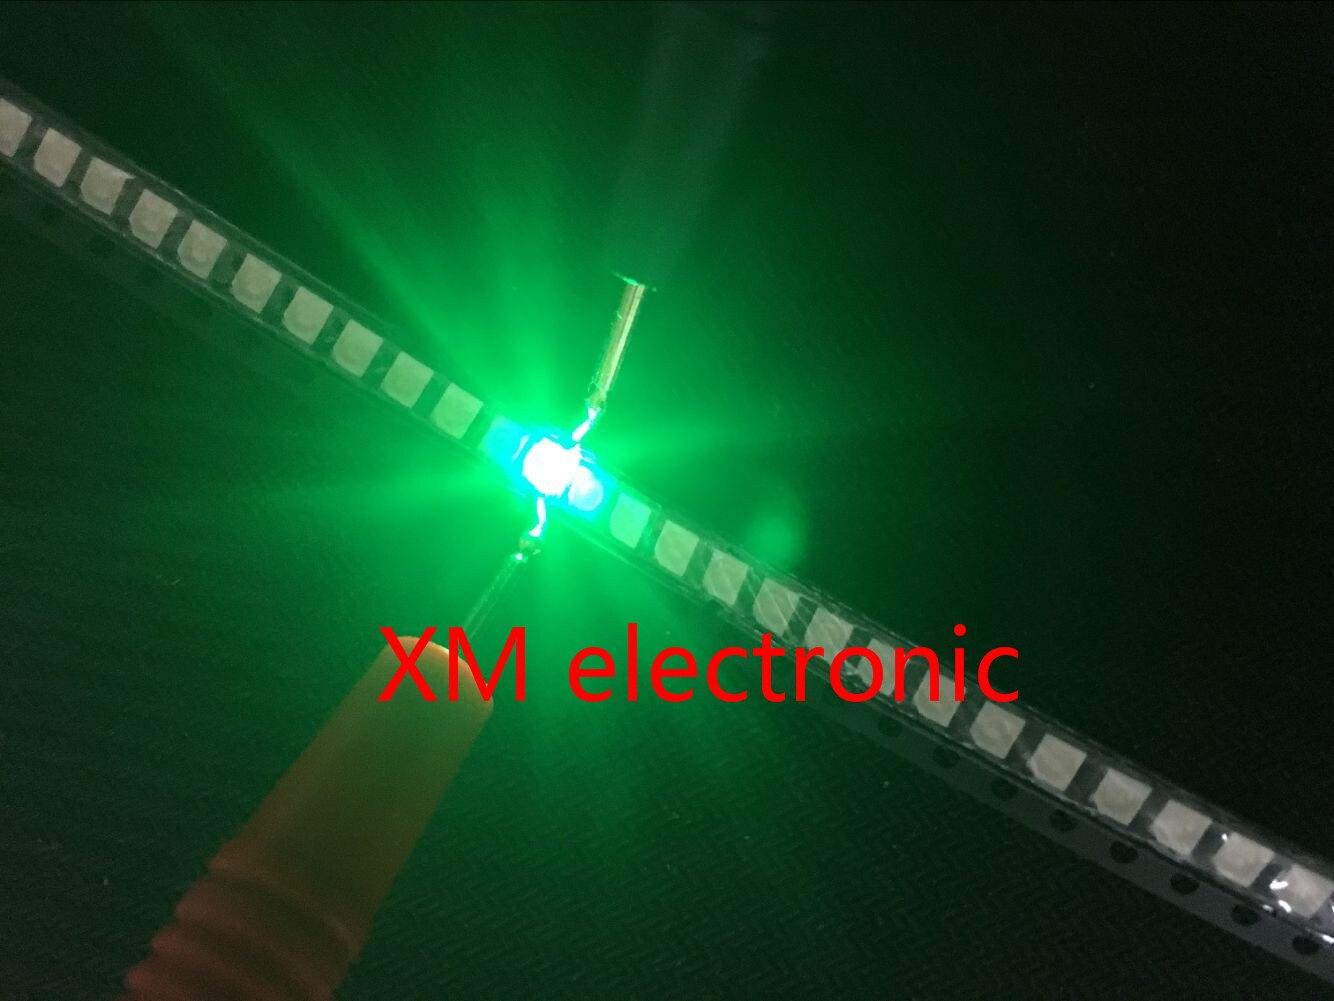 500pcs SMT SMD LED 3528 Green Ultra Bright Light-Emitting Diode LED Diode Chip Lamp